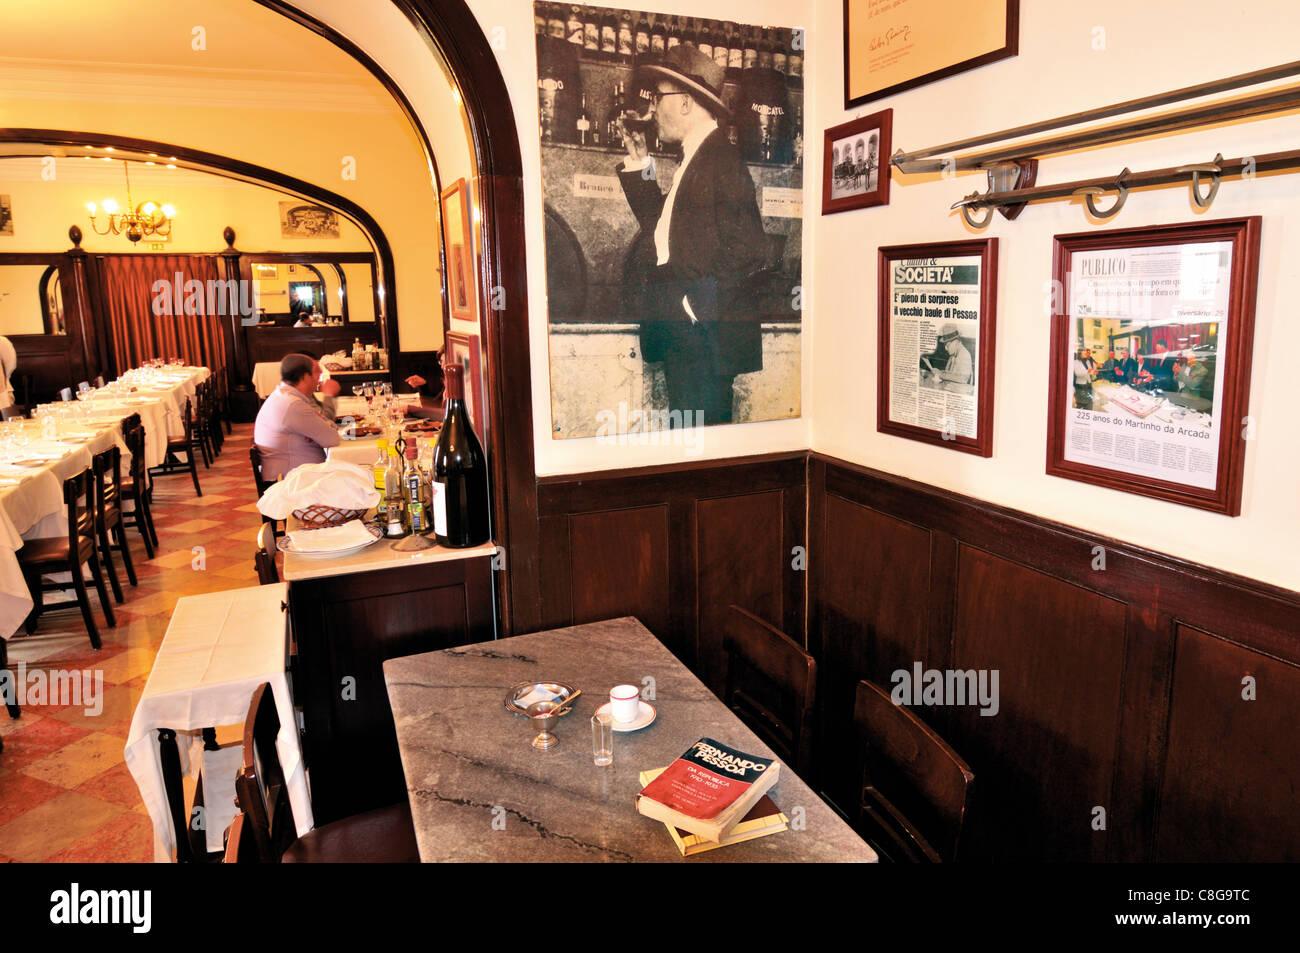 Portugal, Lisbon: Legendary favorite place of national poet Fernando Pessoa in the Coffeehouse Martinho da Arcada - Stock Image